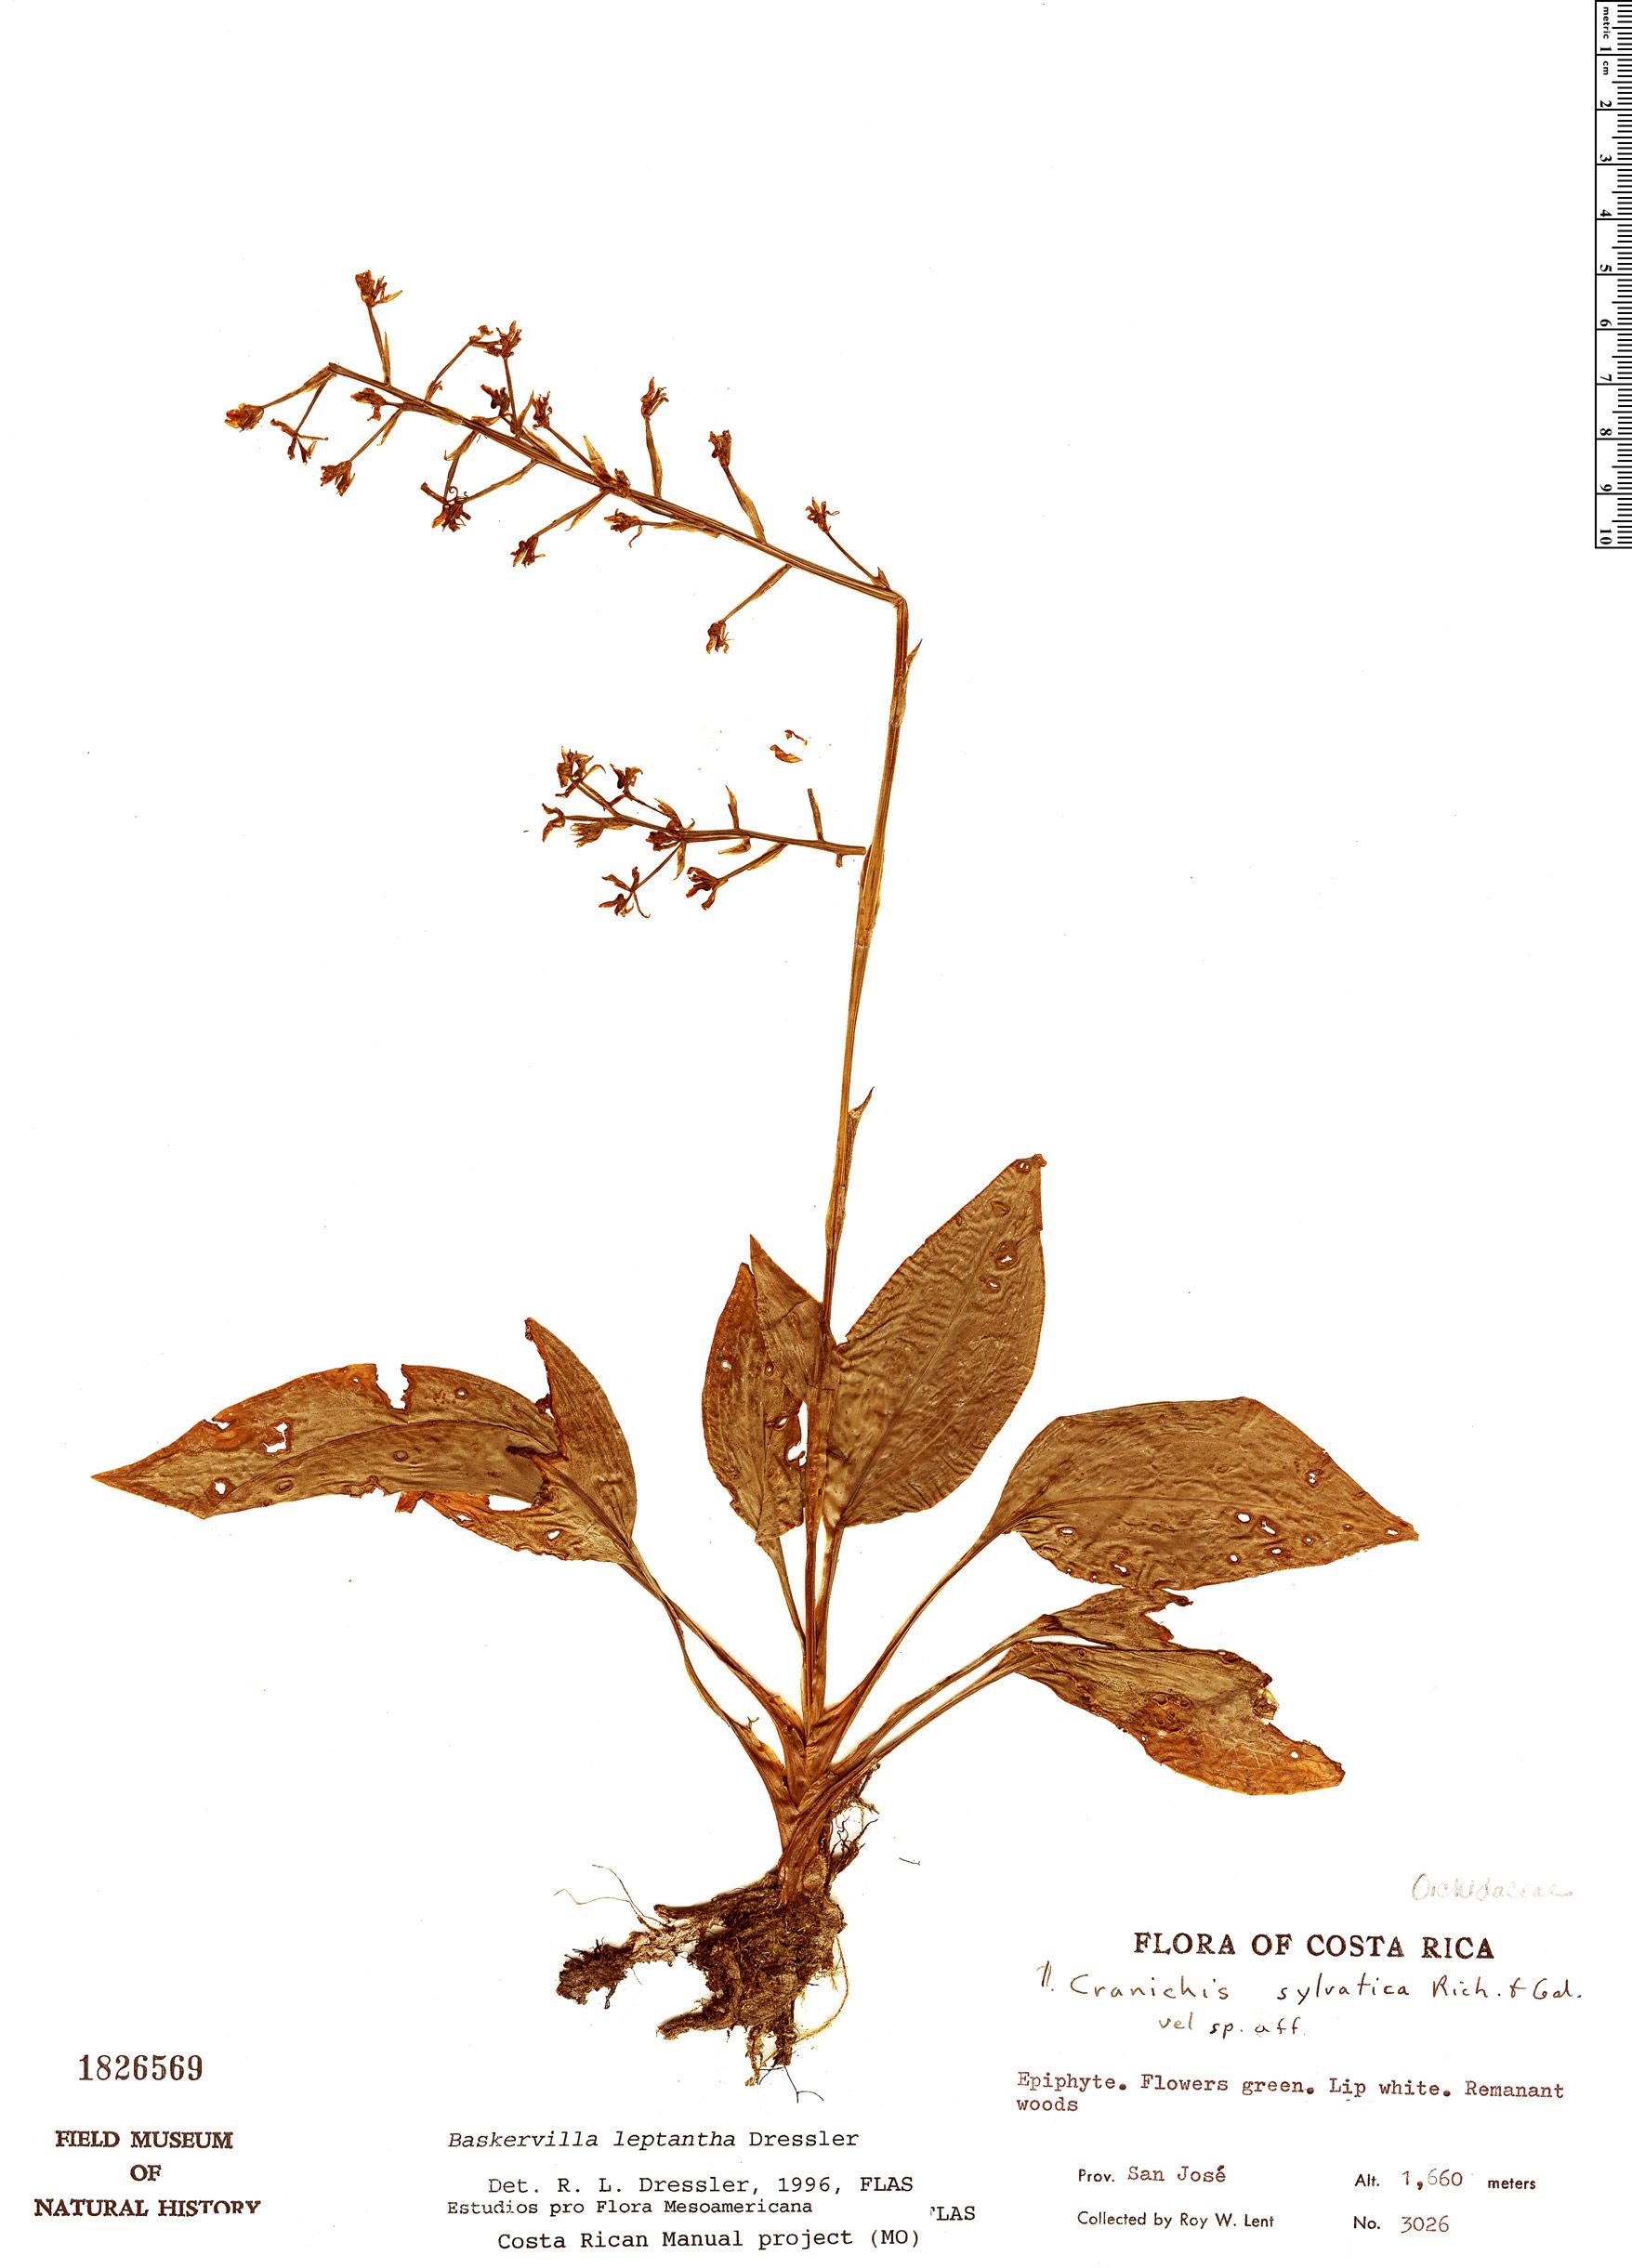 Espécime: Baskervilla leptantha